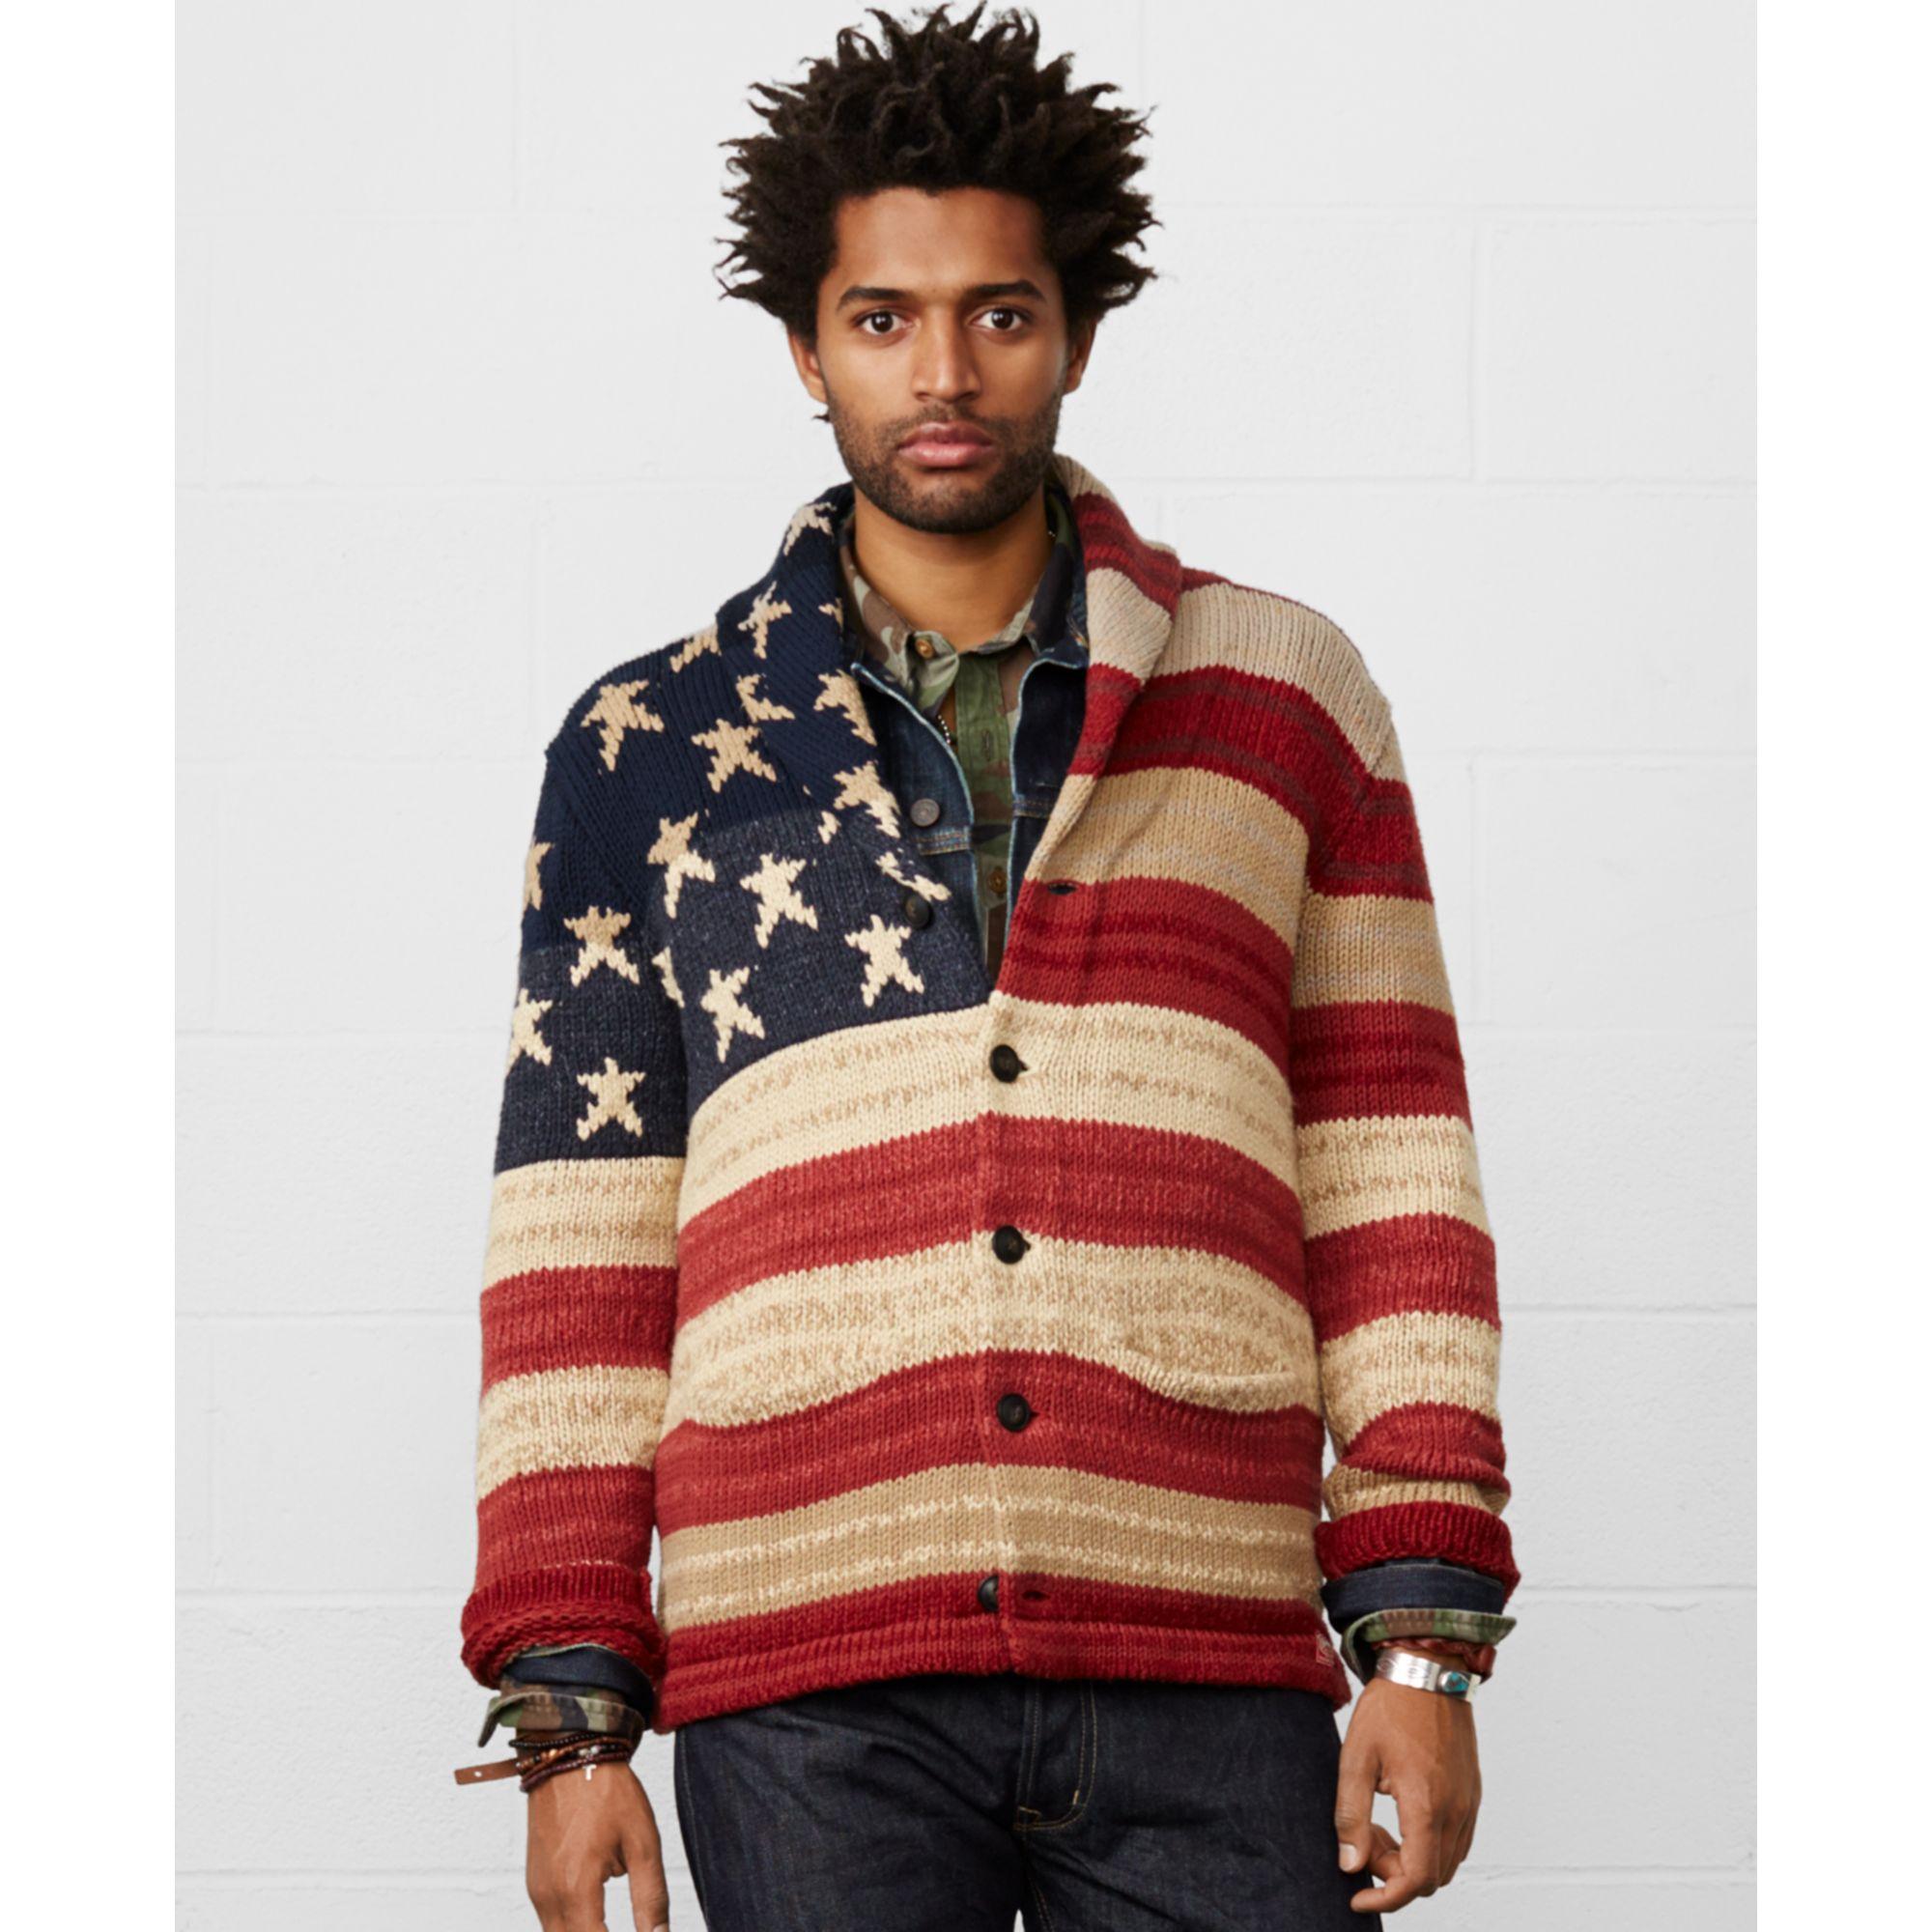 Ralph Lauren American Flag Shawl Sweater 88